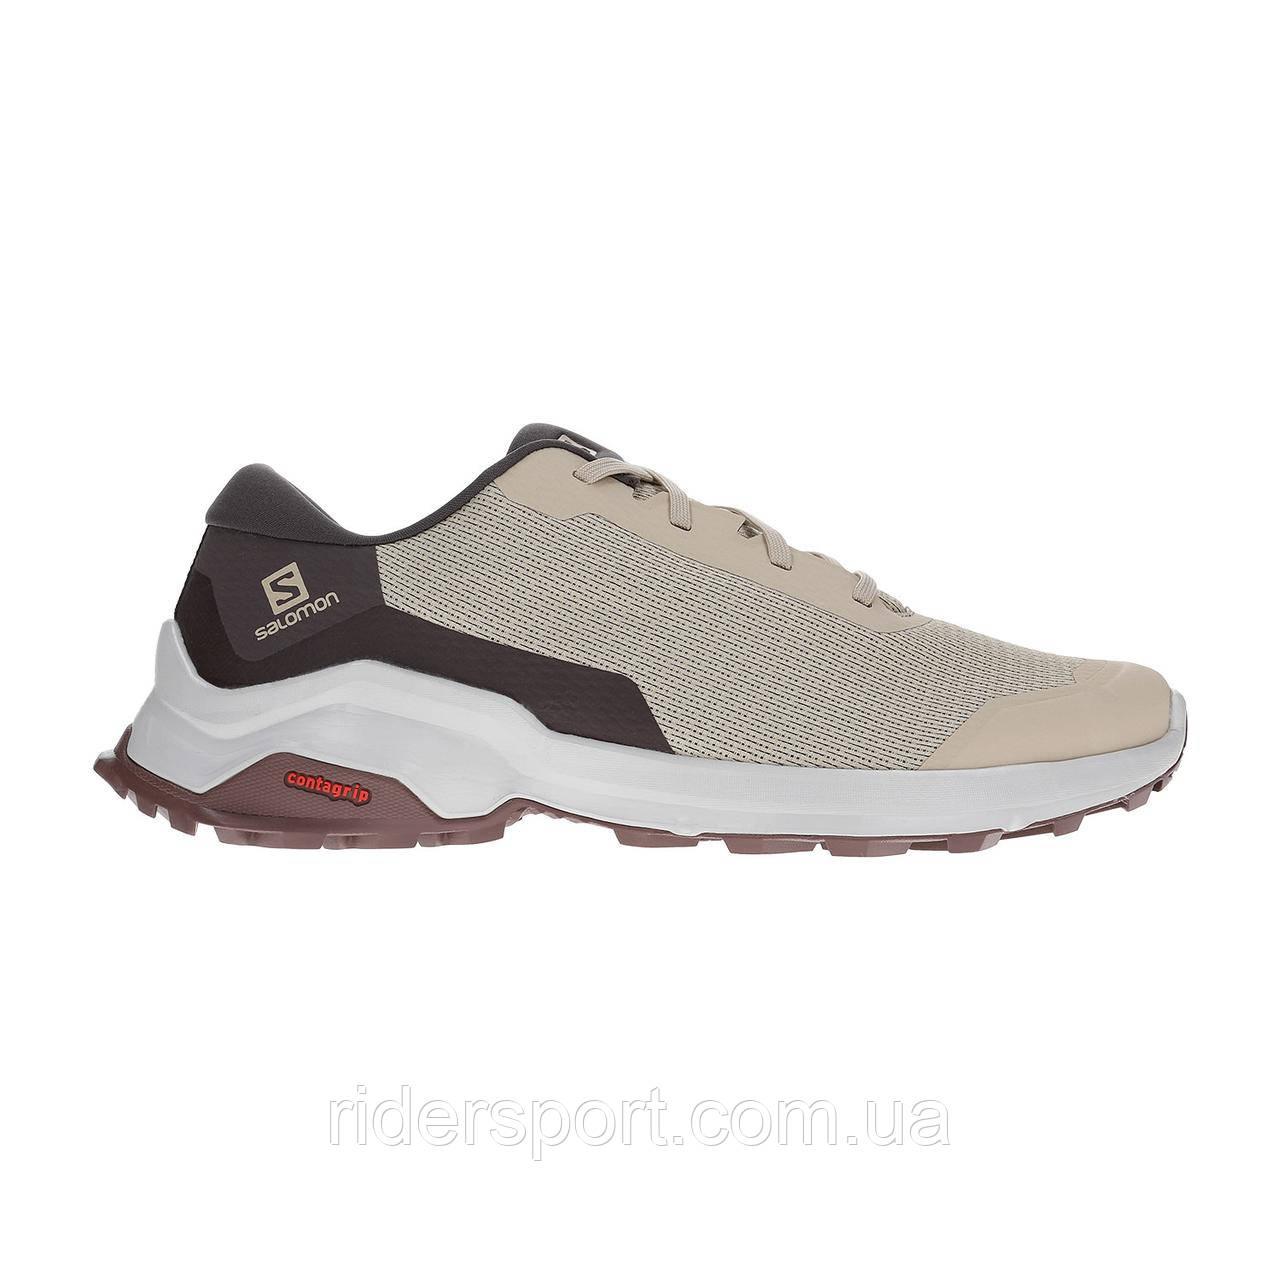 Мужские кроссовки Salomon X Reveal Scarpe L40972500